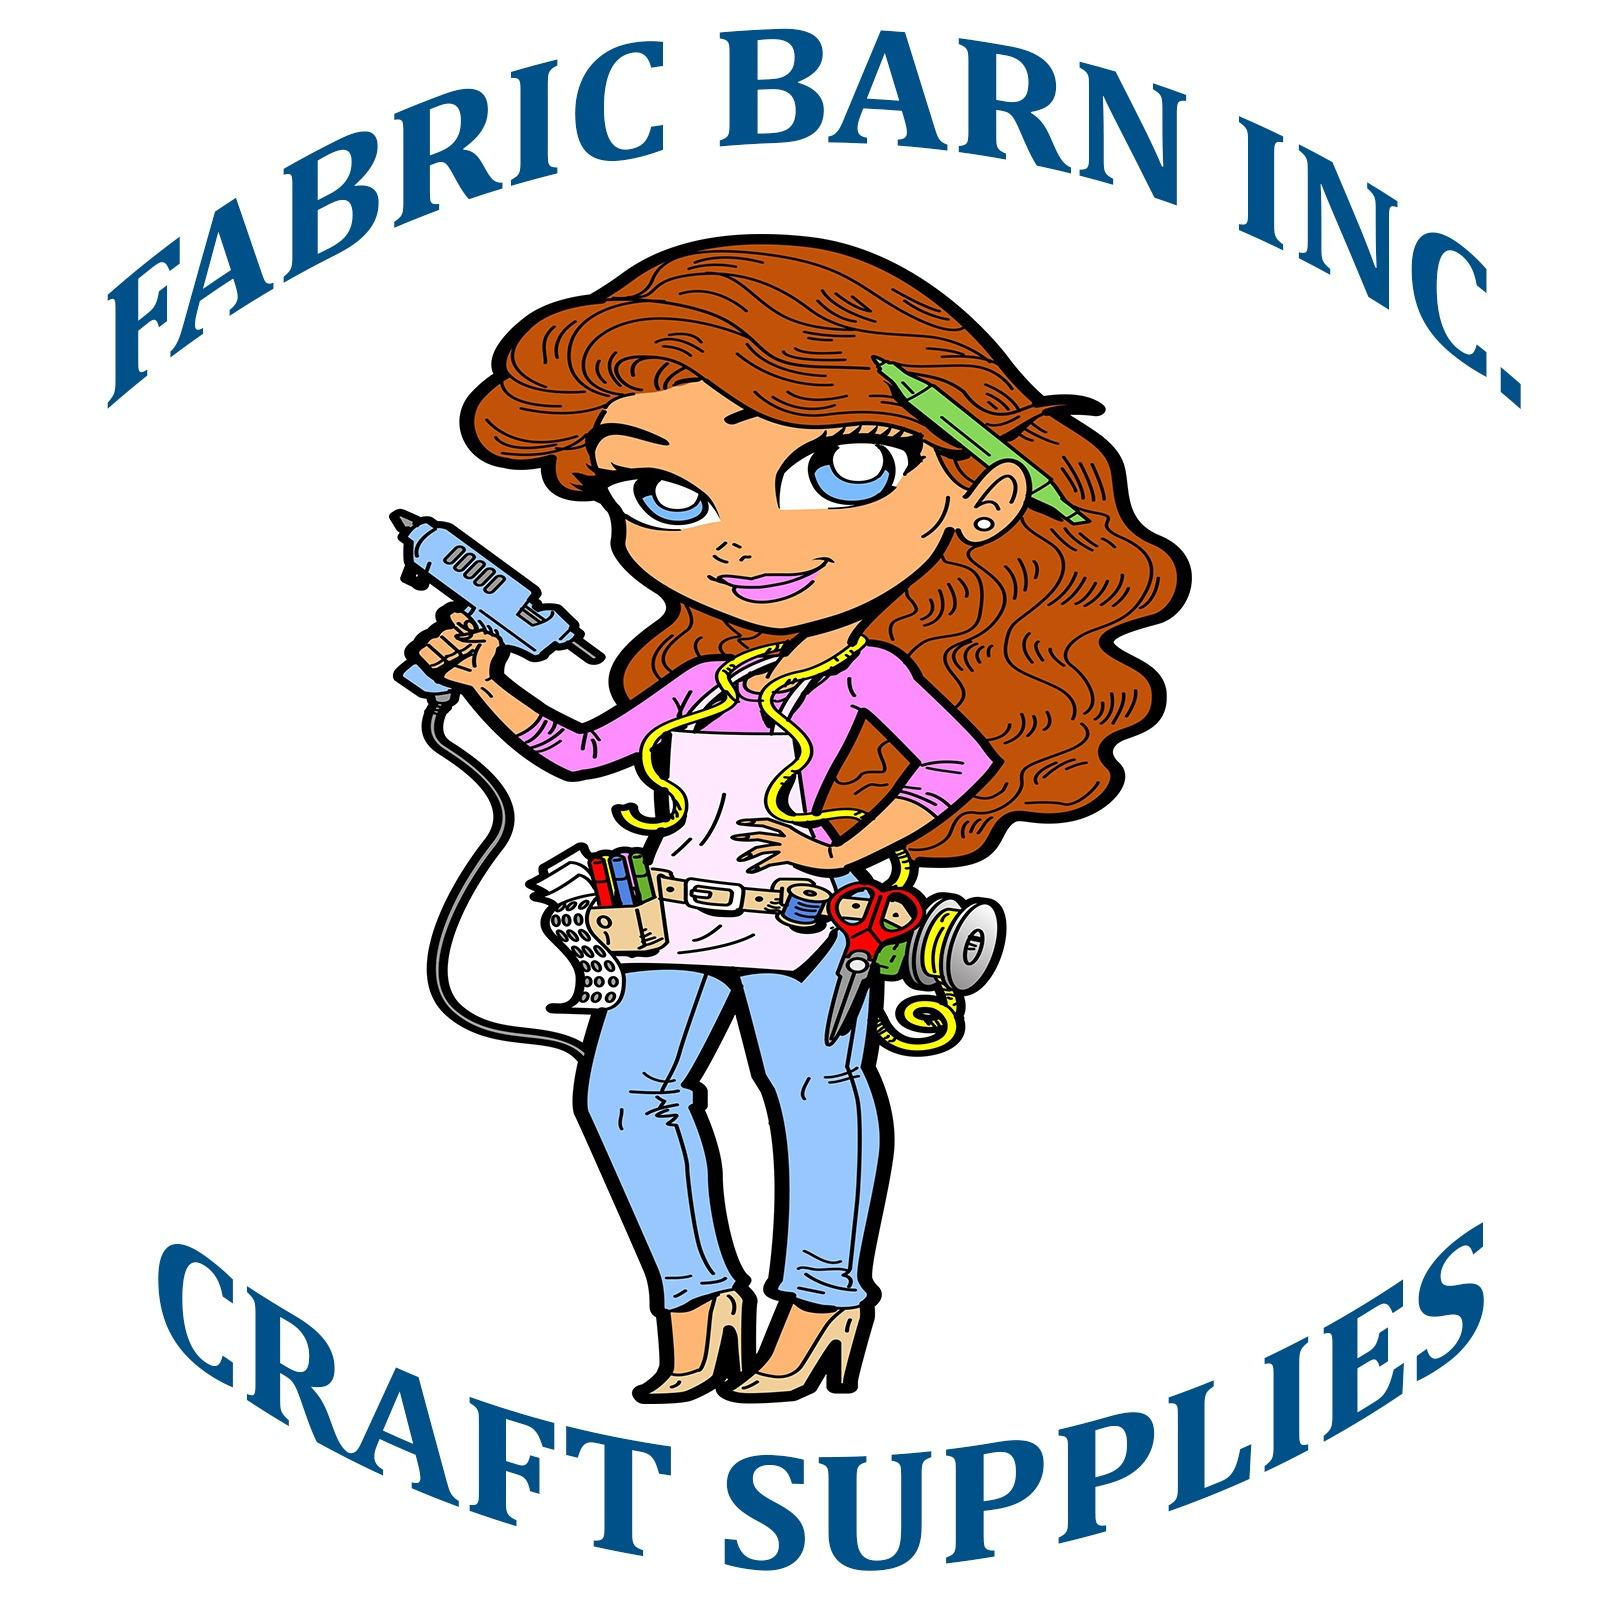 Fabric Barn Inc.